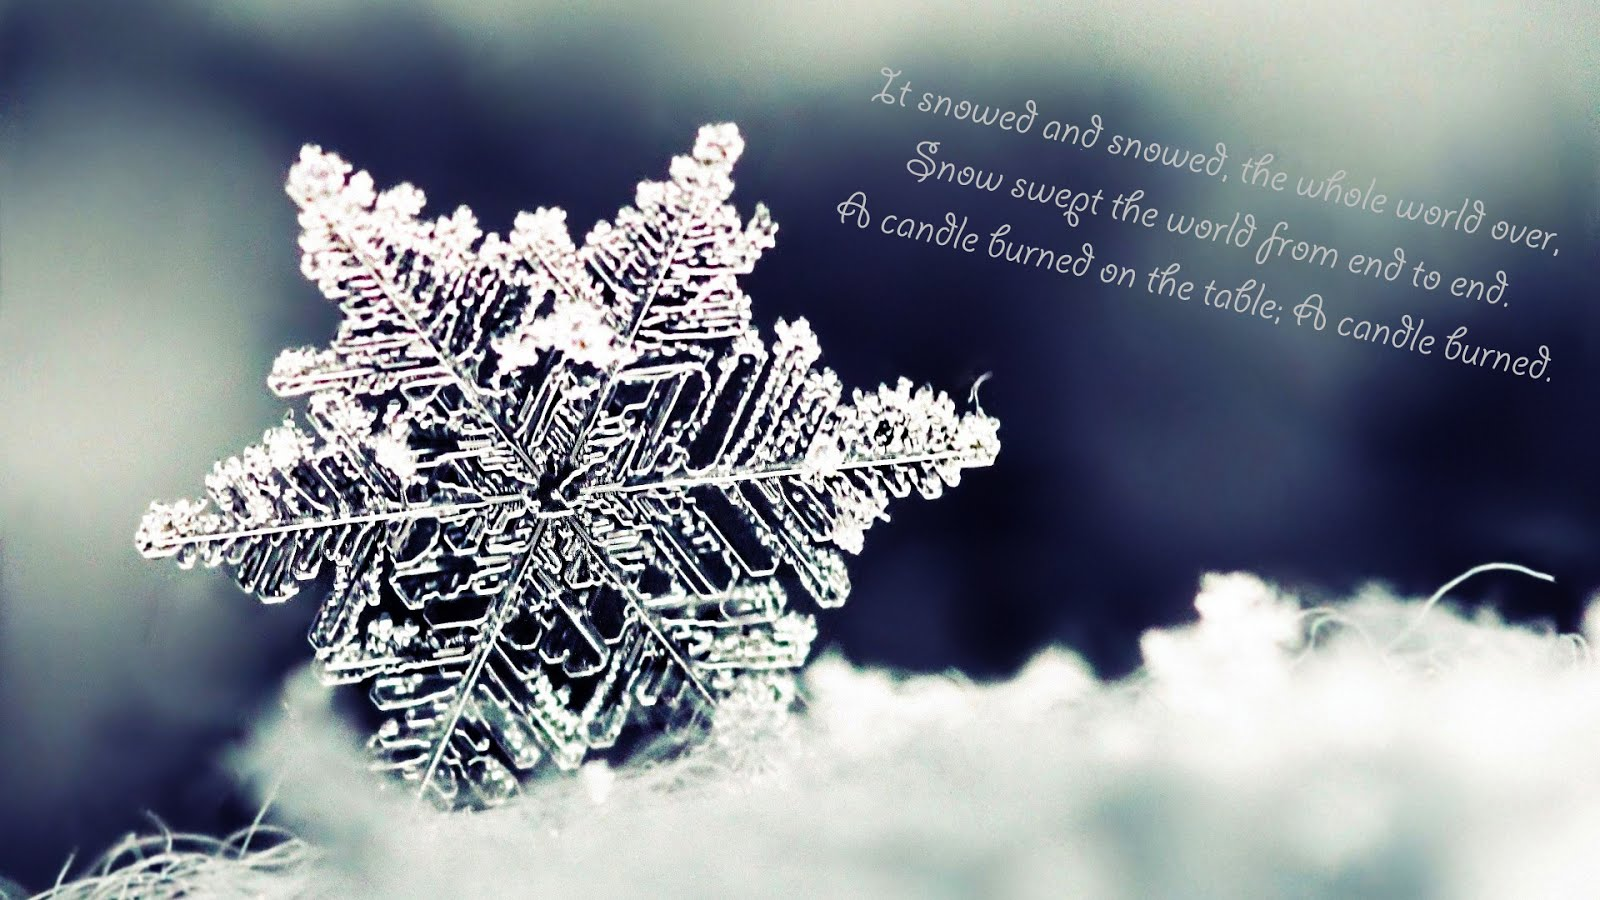 Winter quote #6